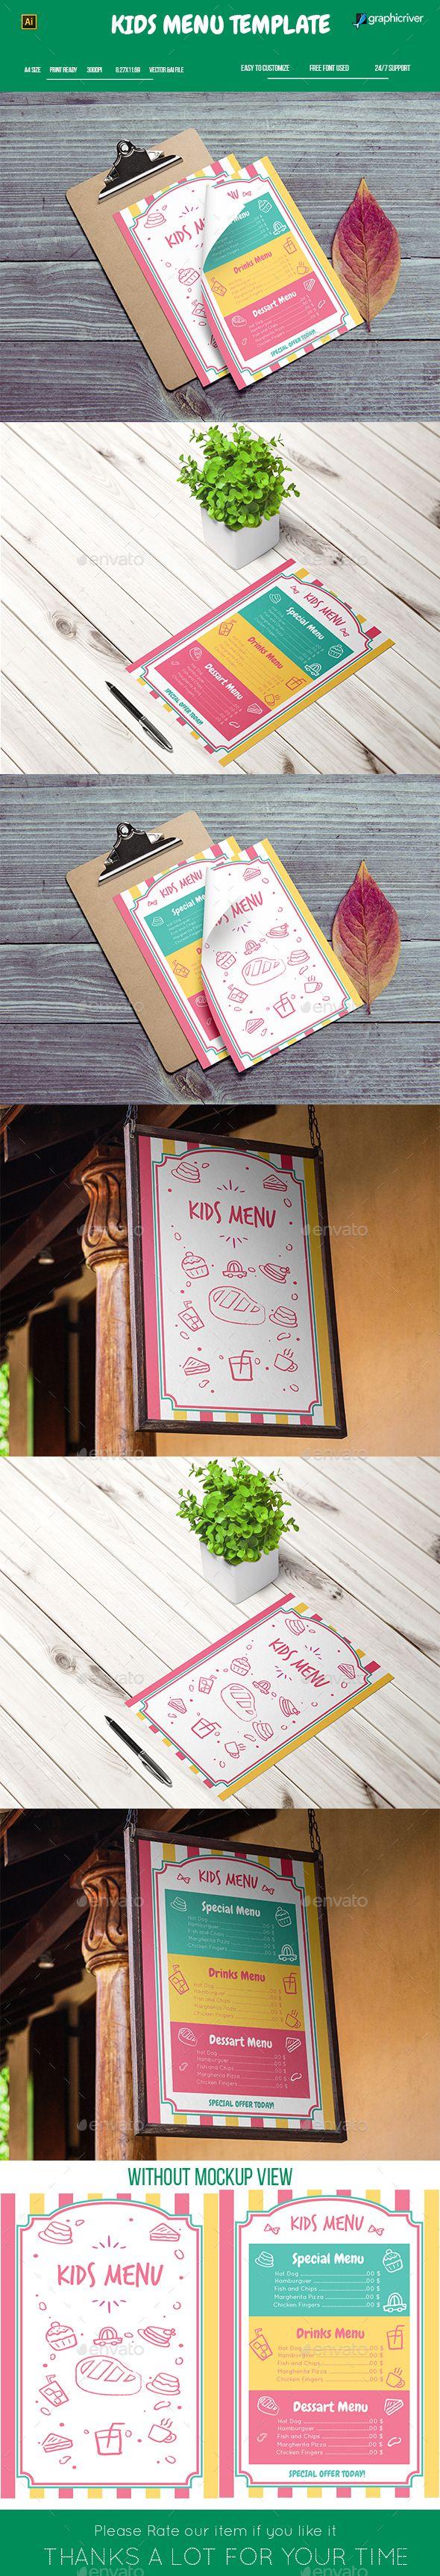 Kids Menu Template — Vector EPS #applebees #cupcakes • Download ➝ https://graphicriver.net/item/kids-menu-template/20121452?ref=pxcr